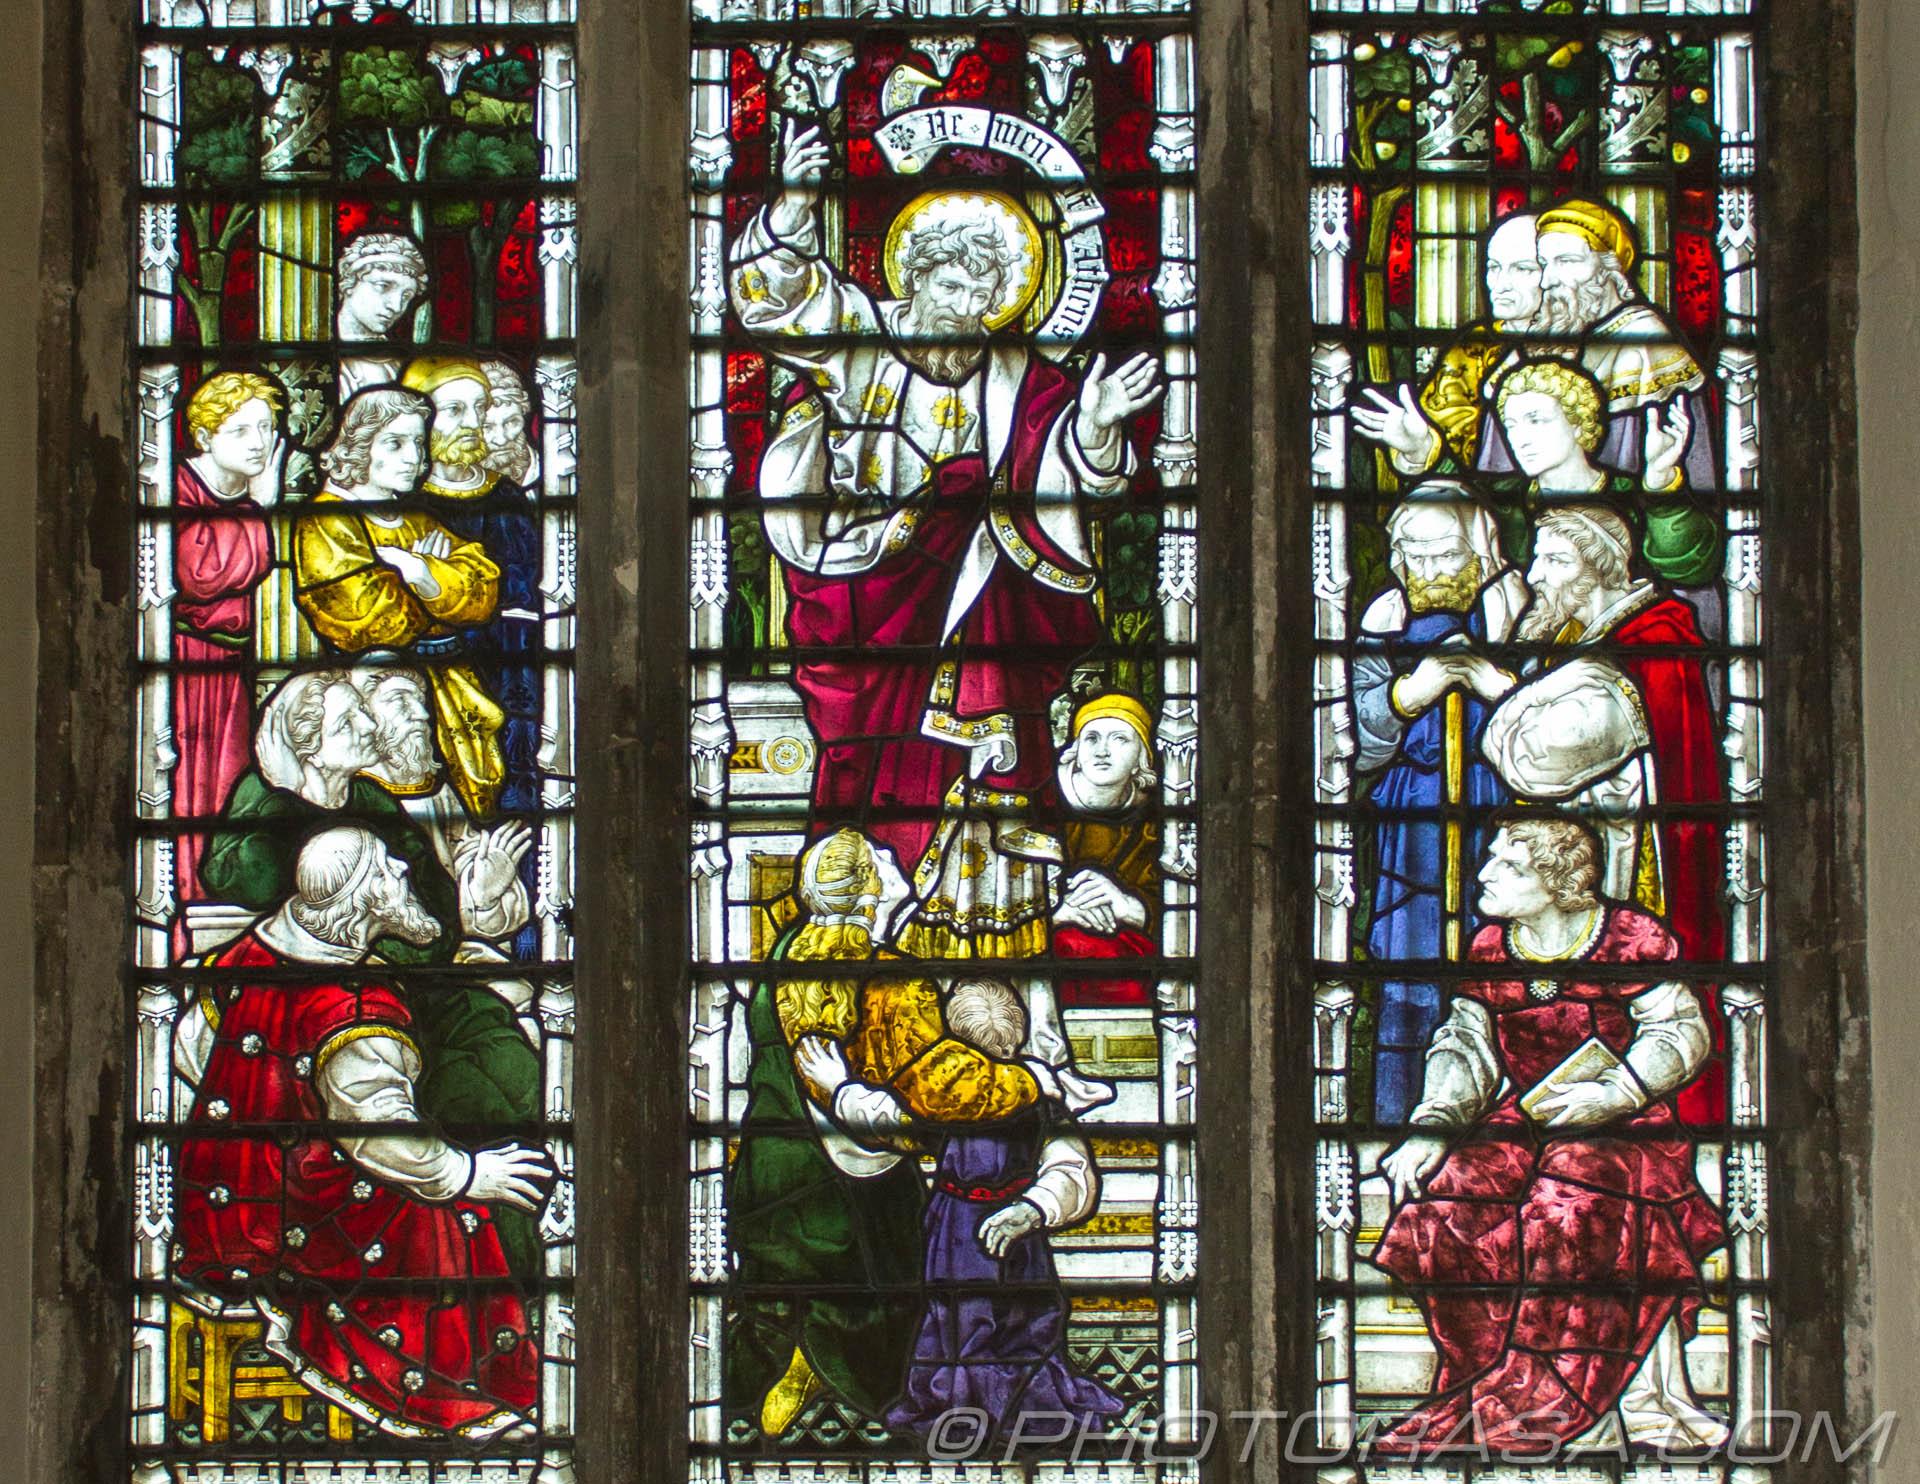 http://photorasa.com/parish-church-st-peter-st-paul-headcorn/north-stained-glass-window-showing-detail-of-jesus-speaking-to-c/